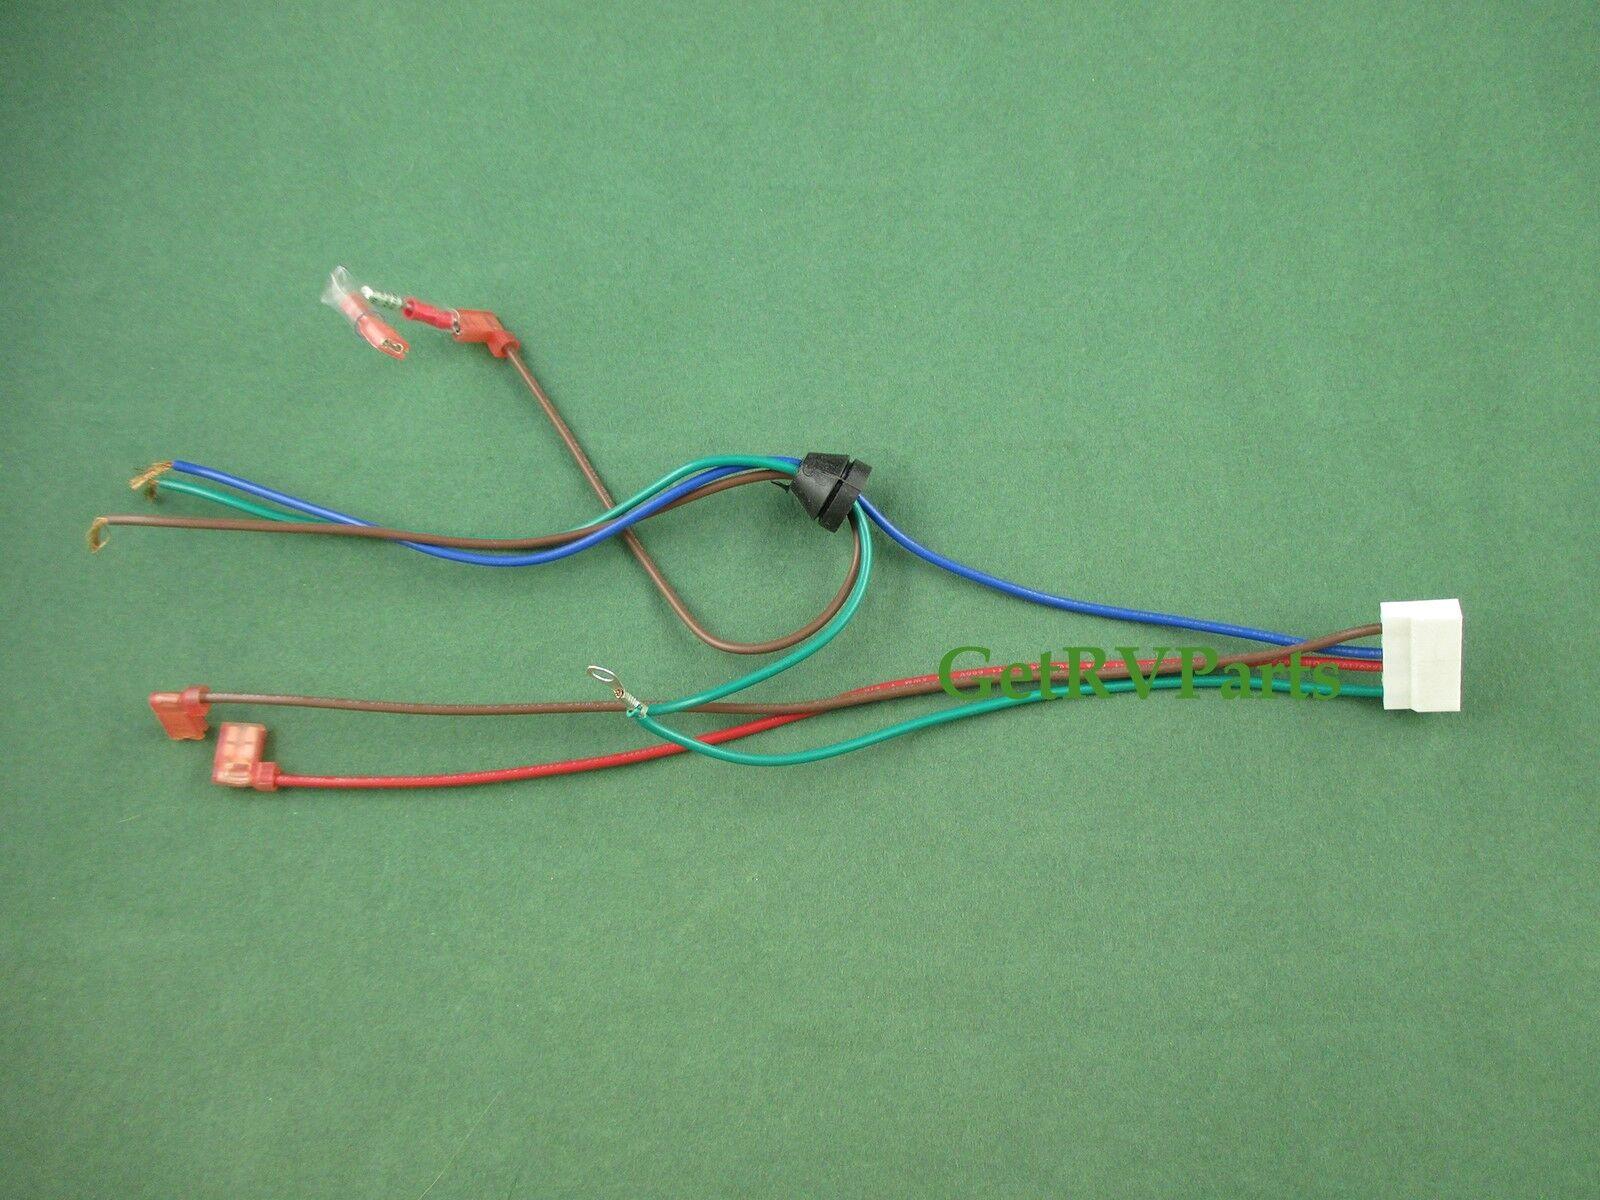 $_57?set_id\\\=880000500F truck camper wire harness wiring diagrams forbiddendoctor org truck camper wire harness at suagrazia.org